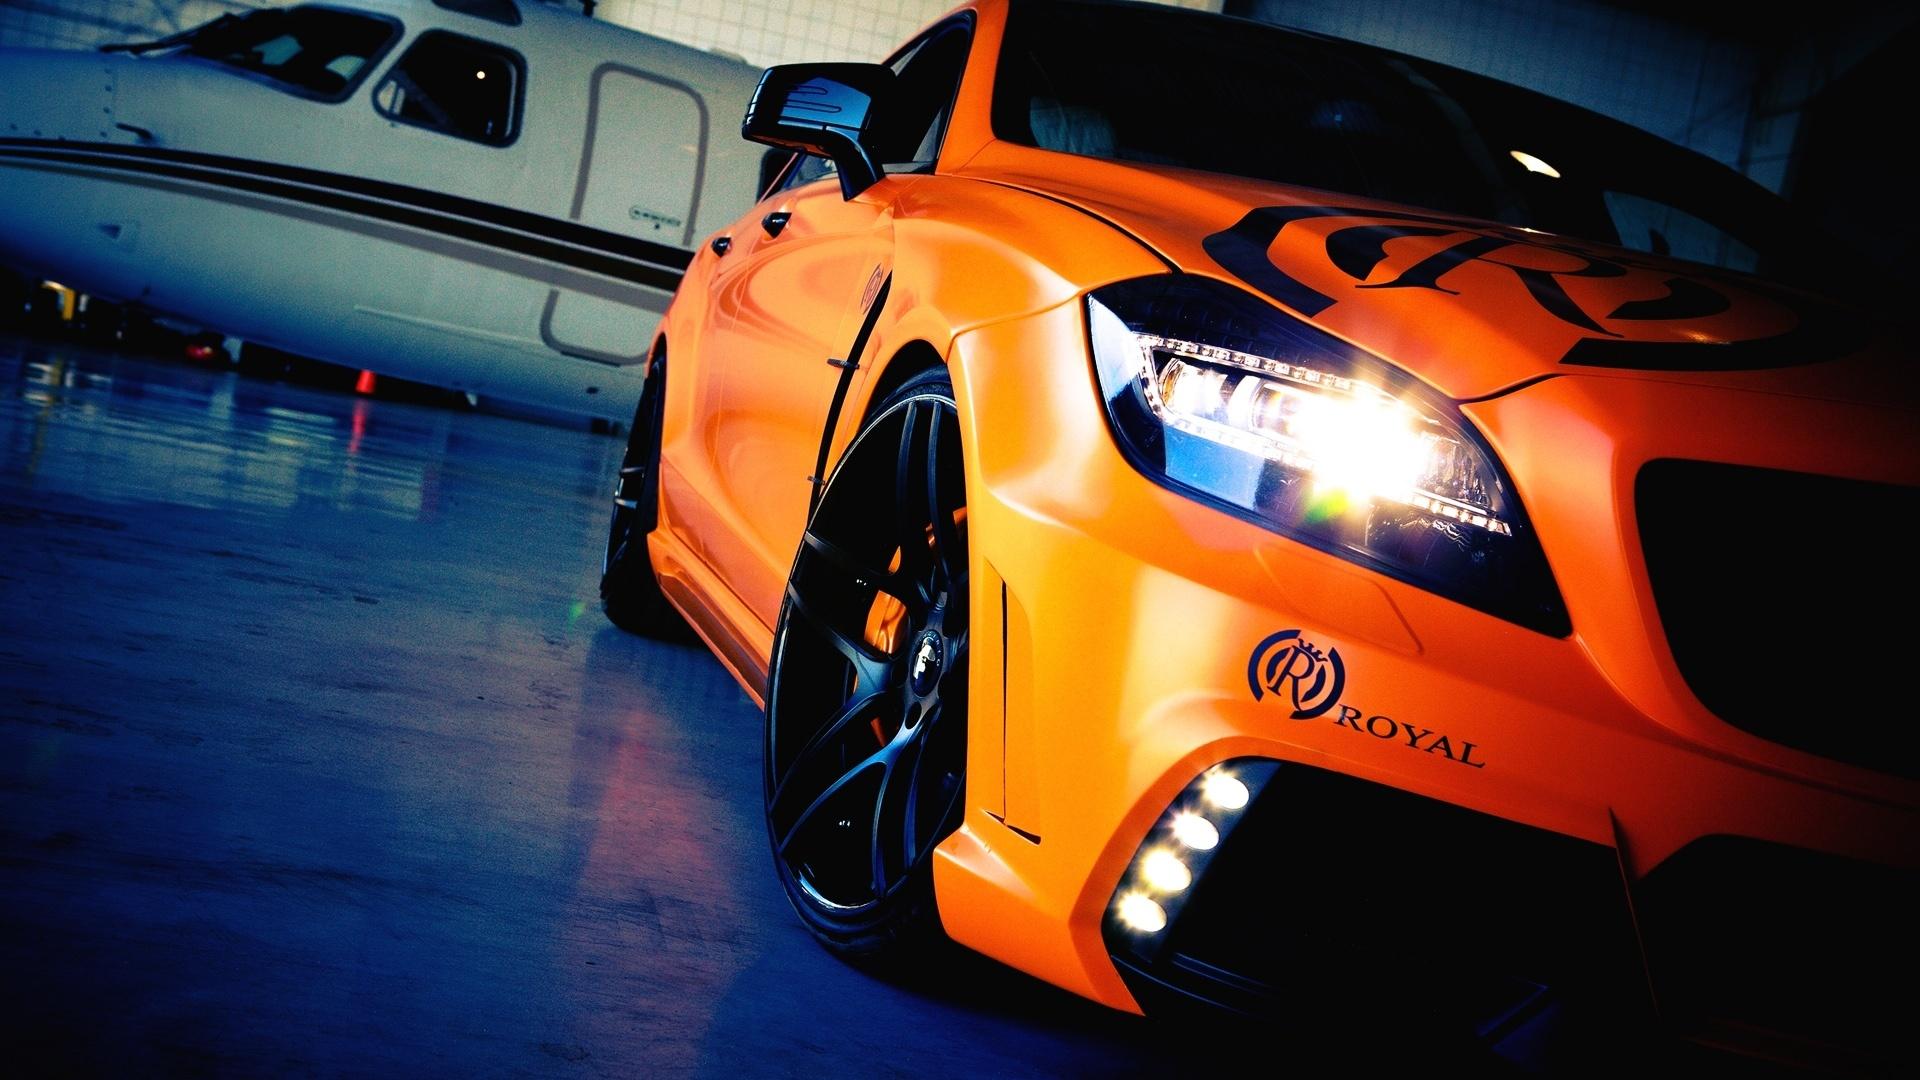 Amazing Orange Car Wallpaper